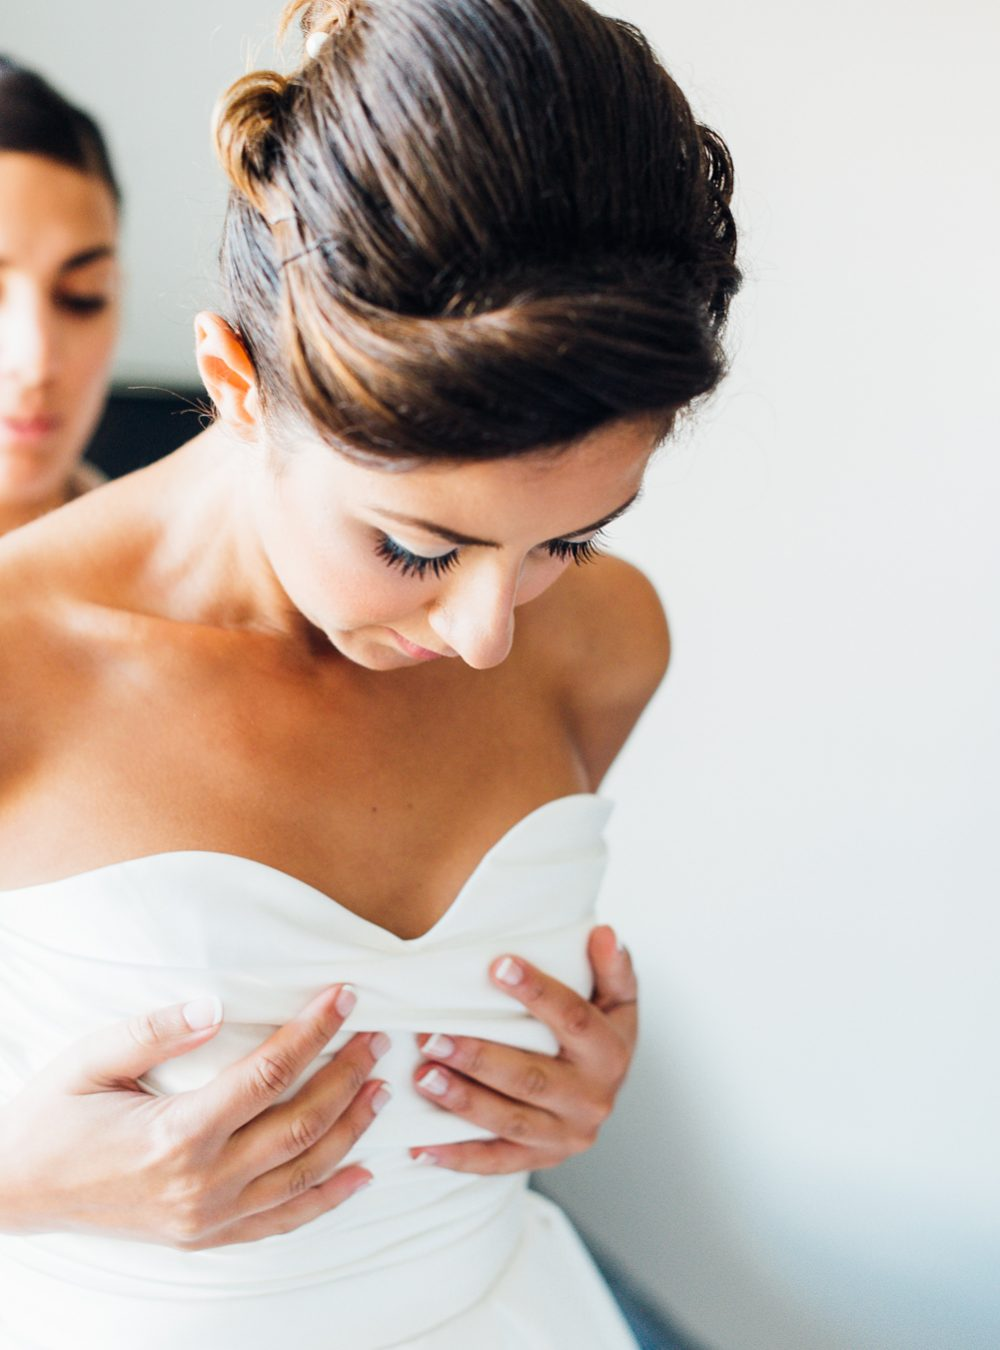 Ali-Shokofan-Asal-Fard-Wedding-Brollop-Telegrafberget-Persian-Nacka-Stockholm-Fotograf-Martina-Lundborg-7